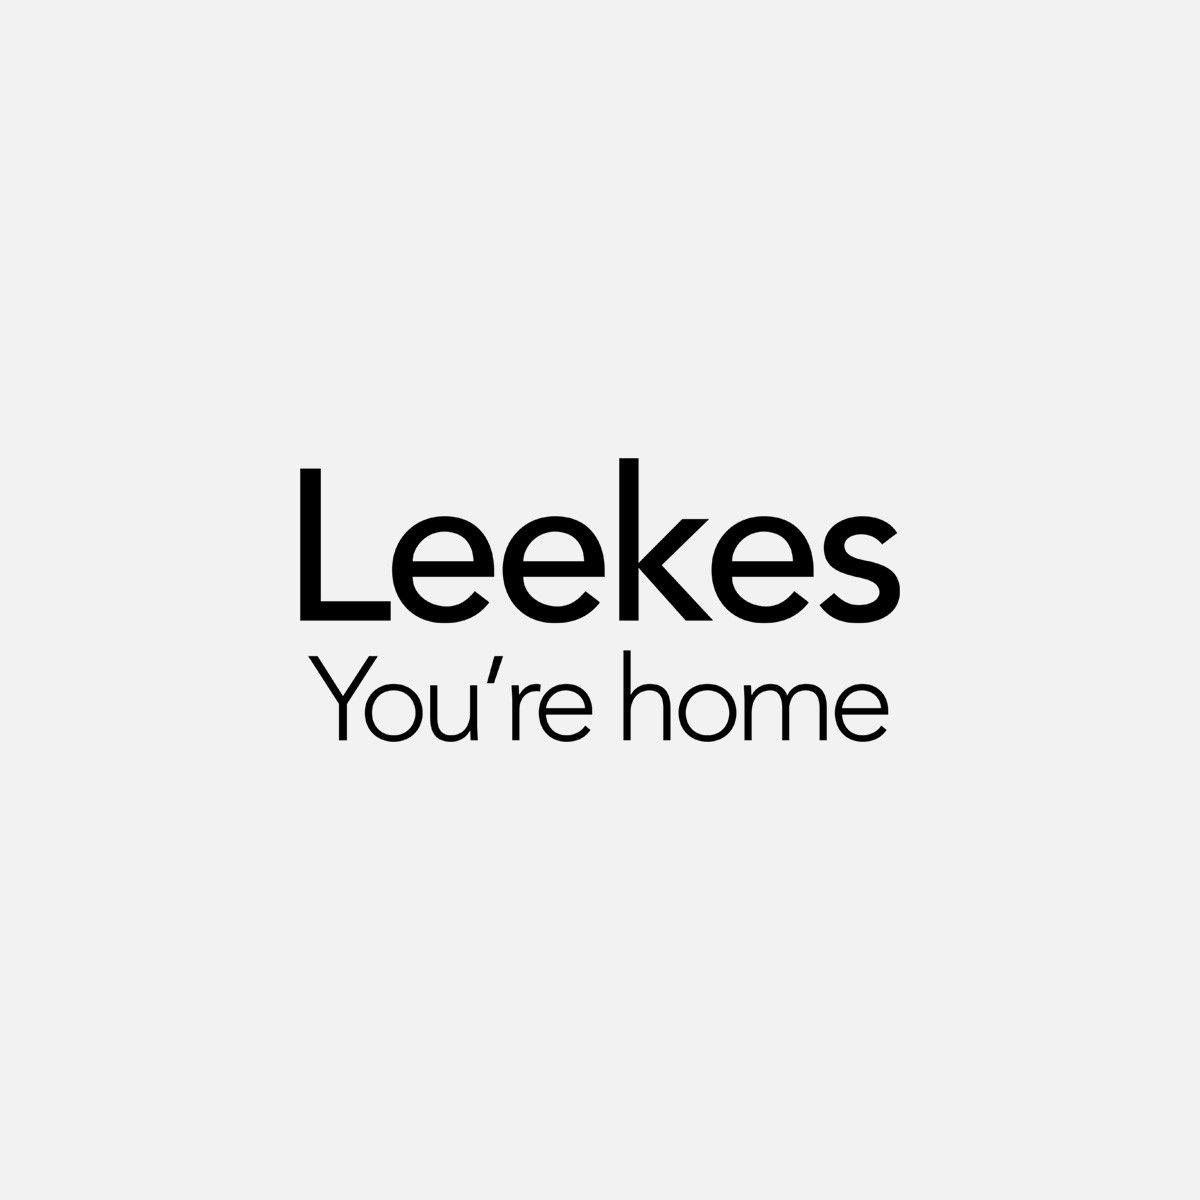 Dualit Classic Kettle Copper Leekes : 6574721l from www.leekes.co.uk size 1500 x 1500 jpeg 222kB